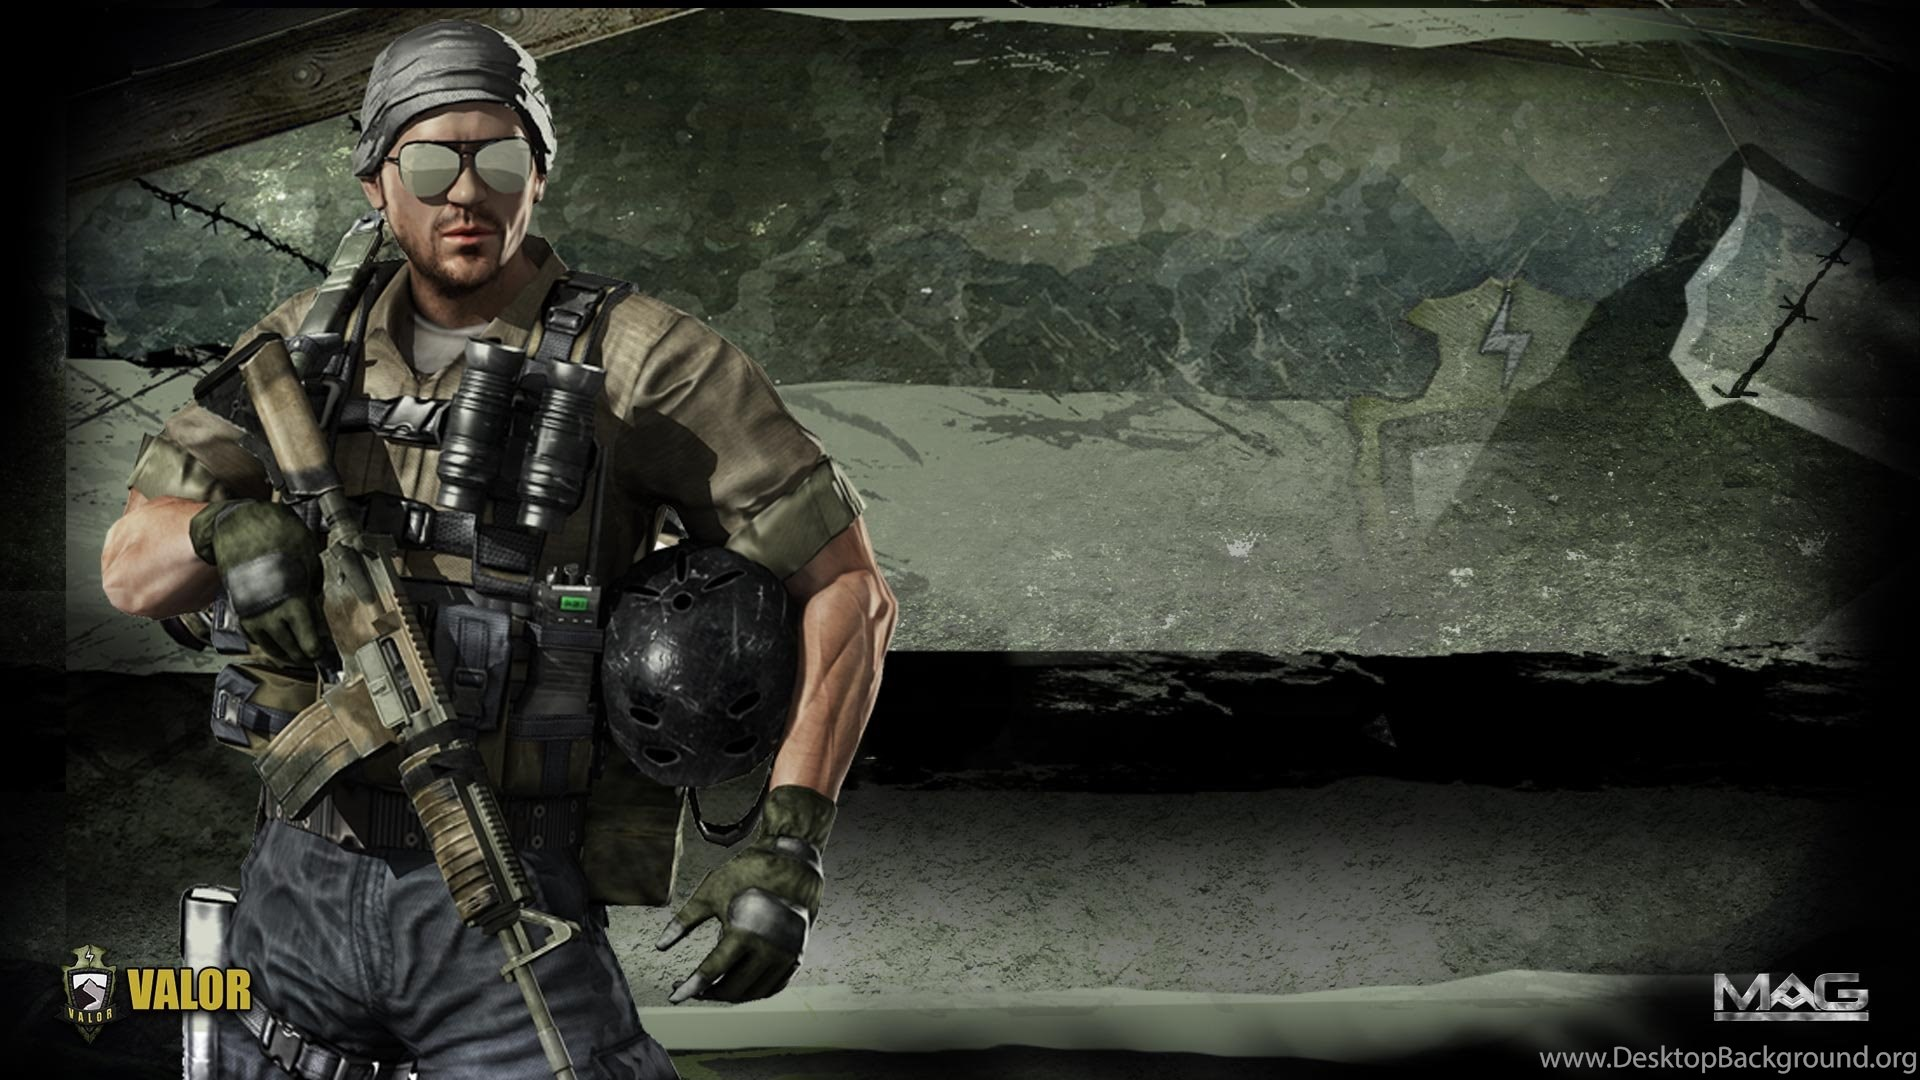 Fallout 3 Brotherhood Of Steel Wallpapers 35558 Desktop Background